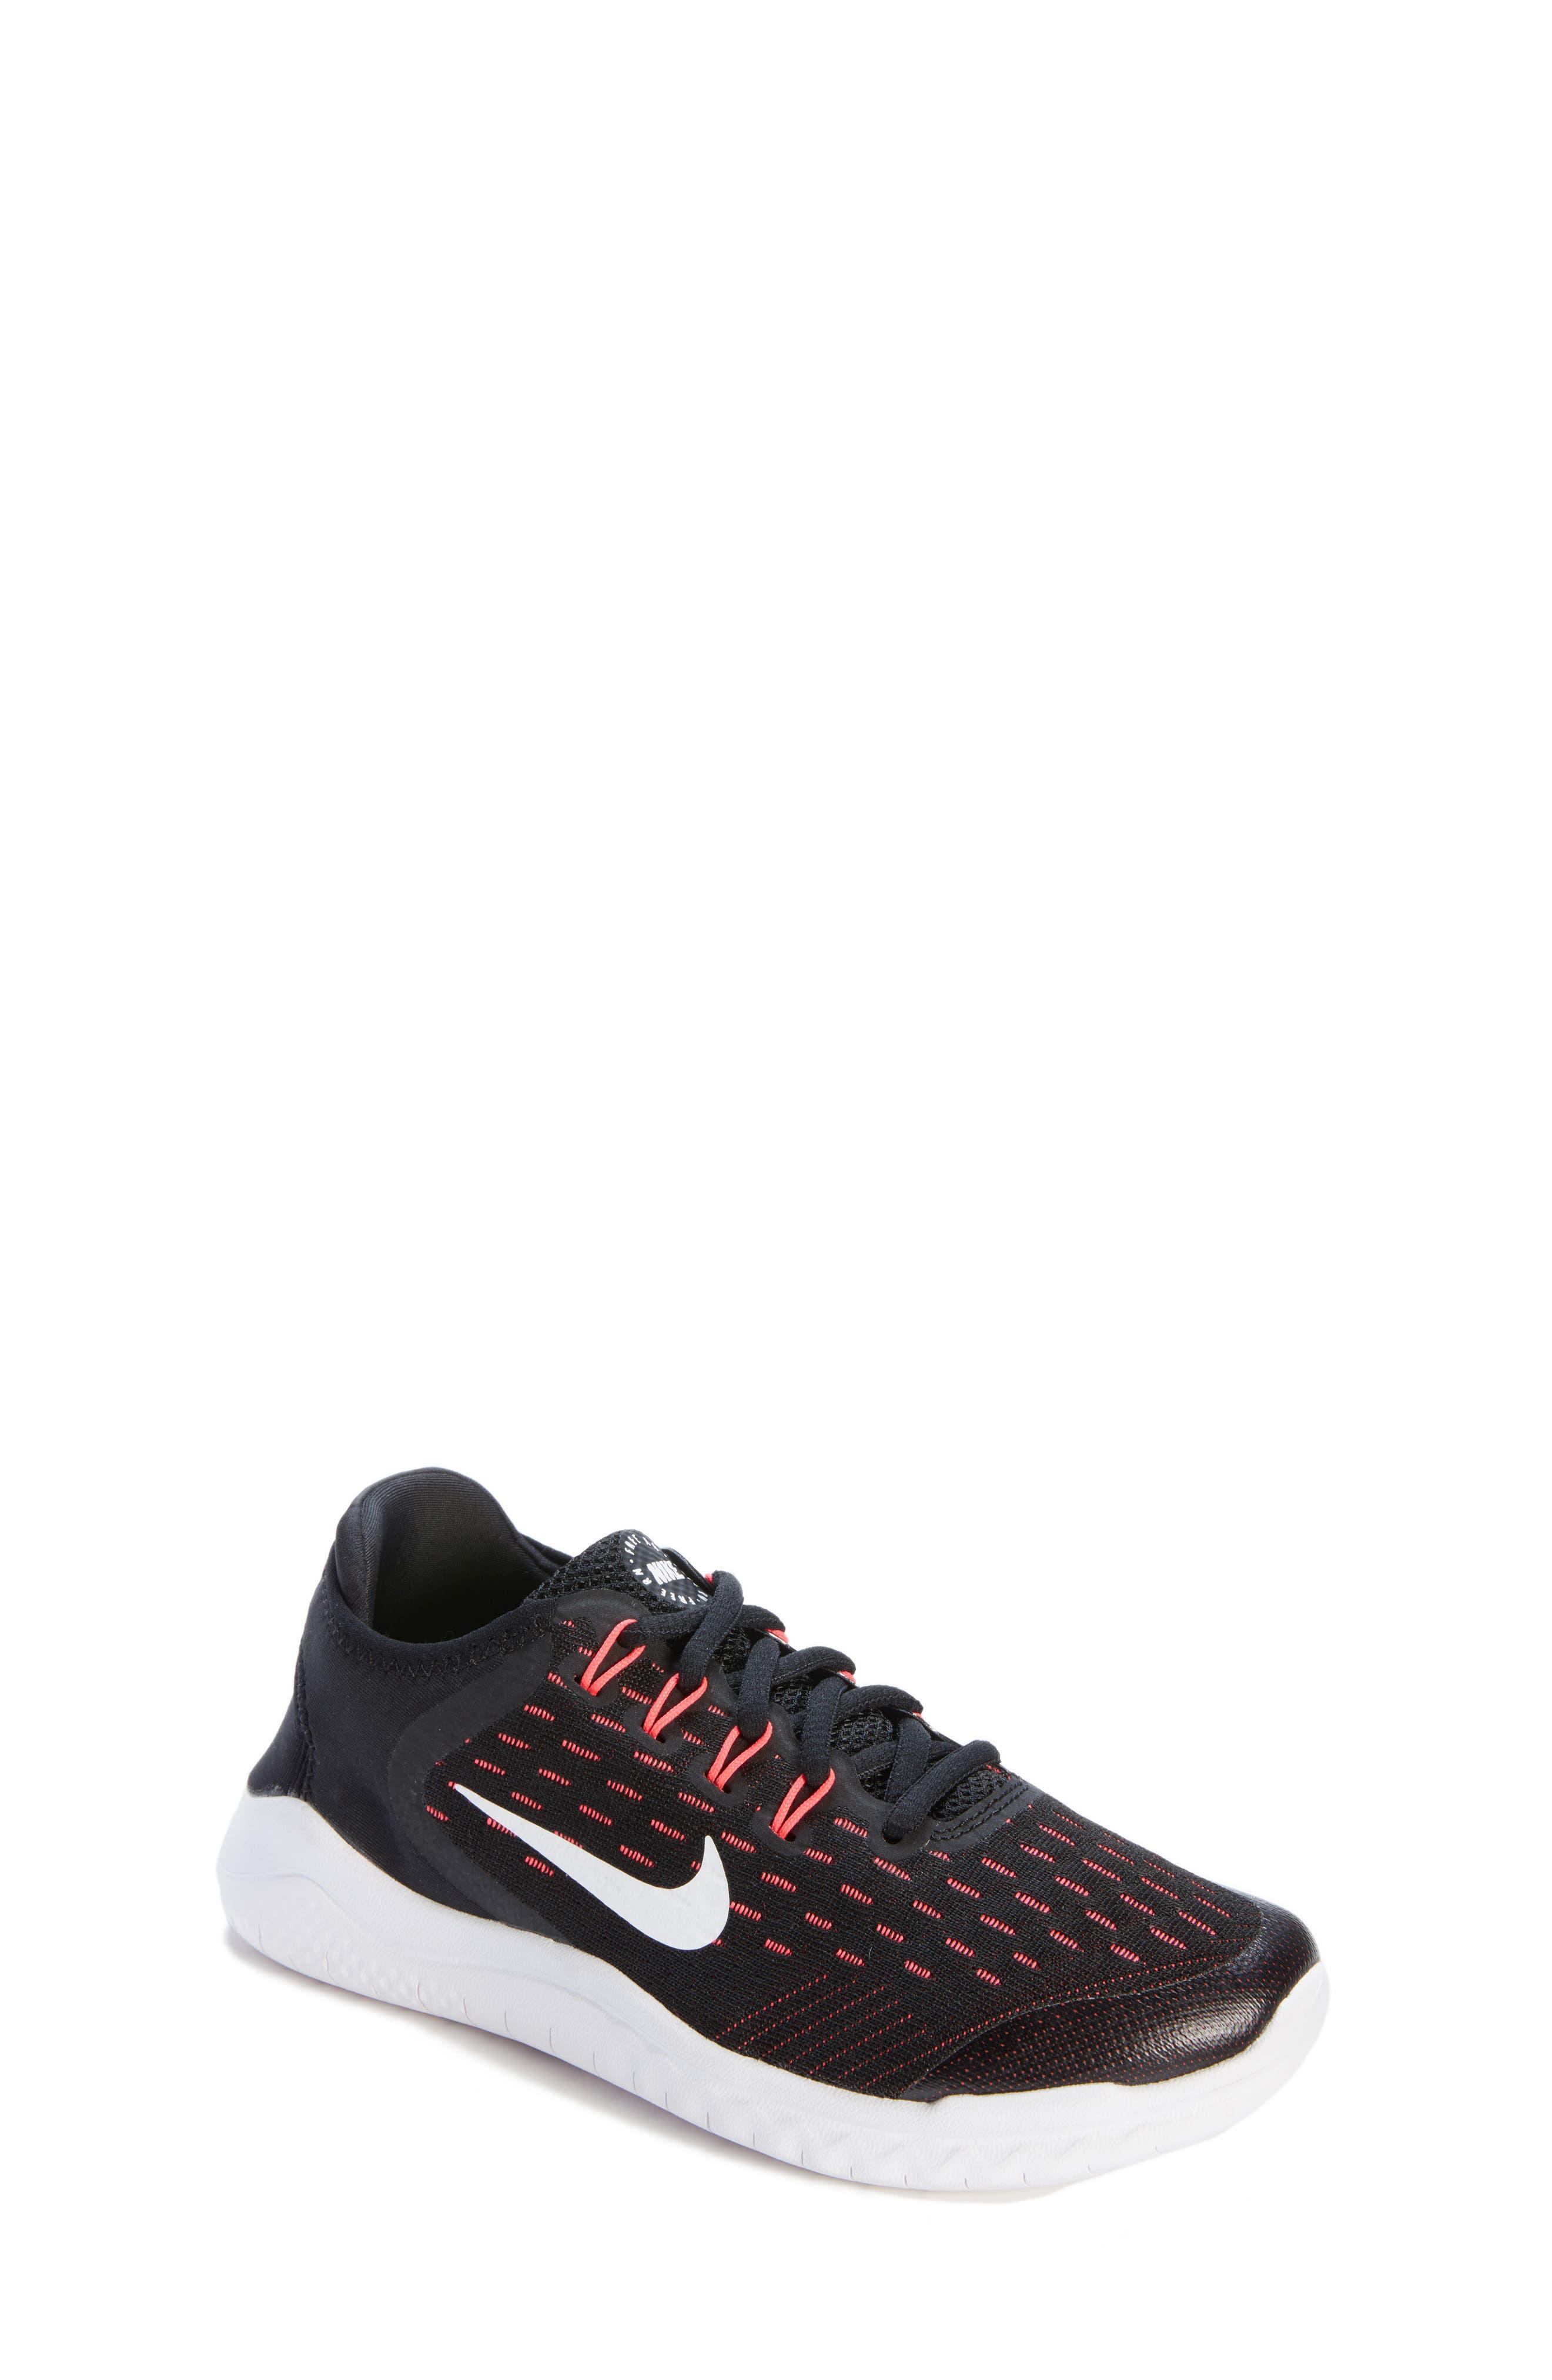 Free RN 2018 Running Shoe,                             Main thumbnail 1, color,                             Black/ White/ Pink/ Volt